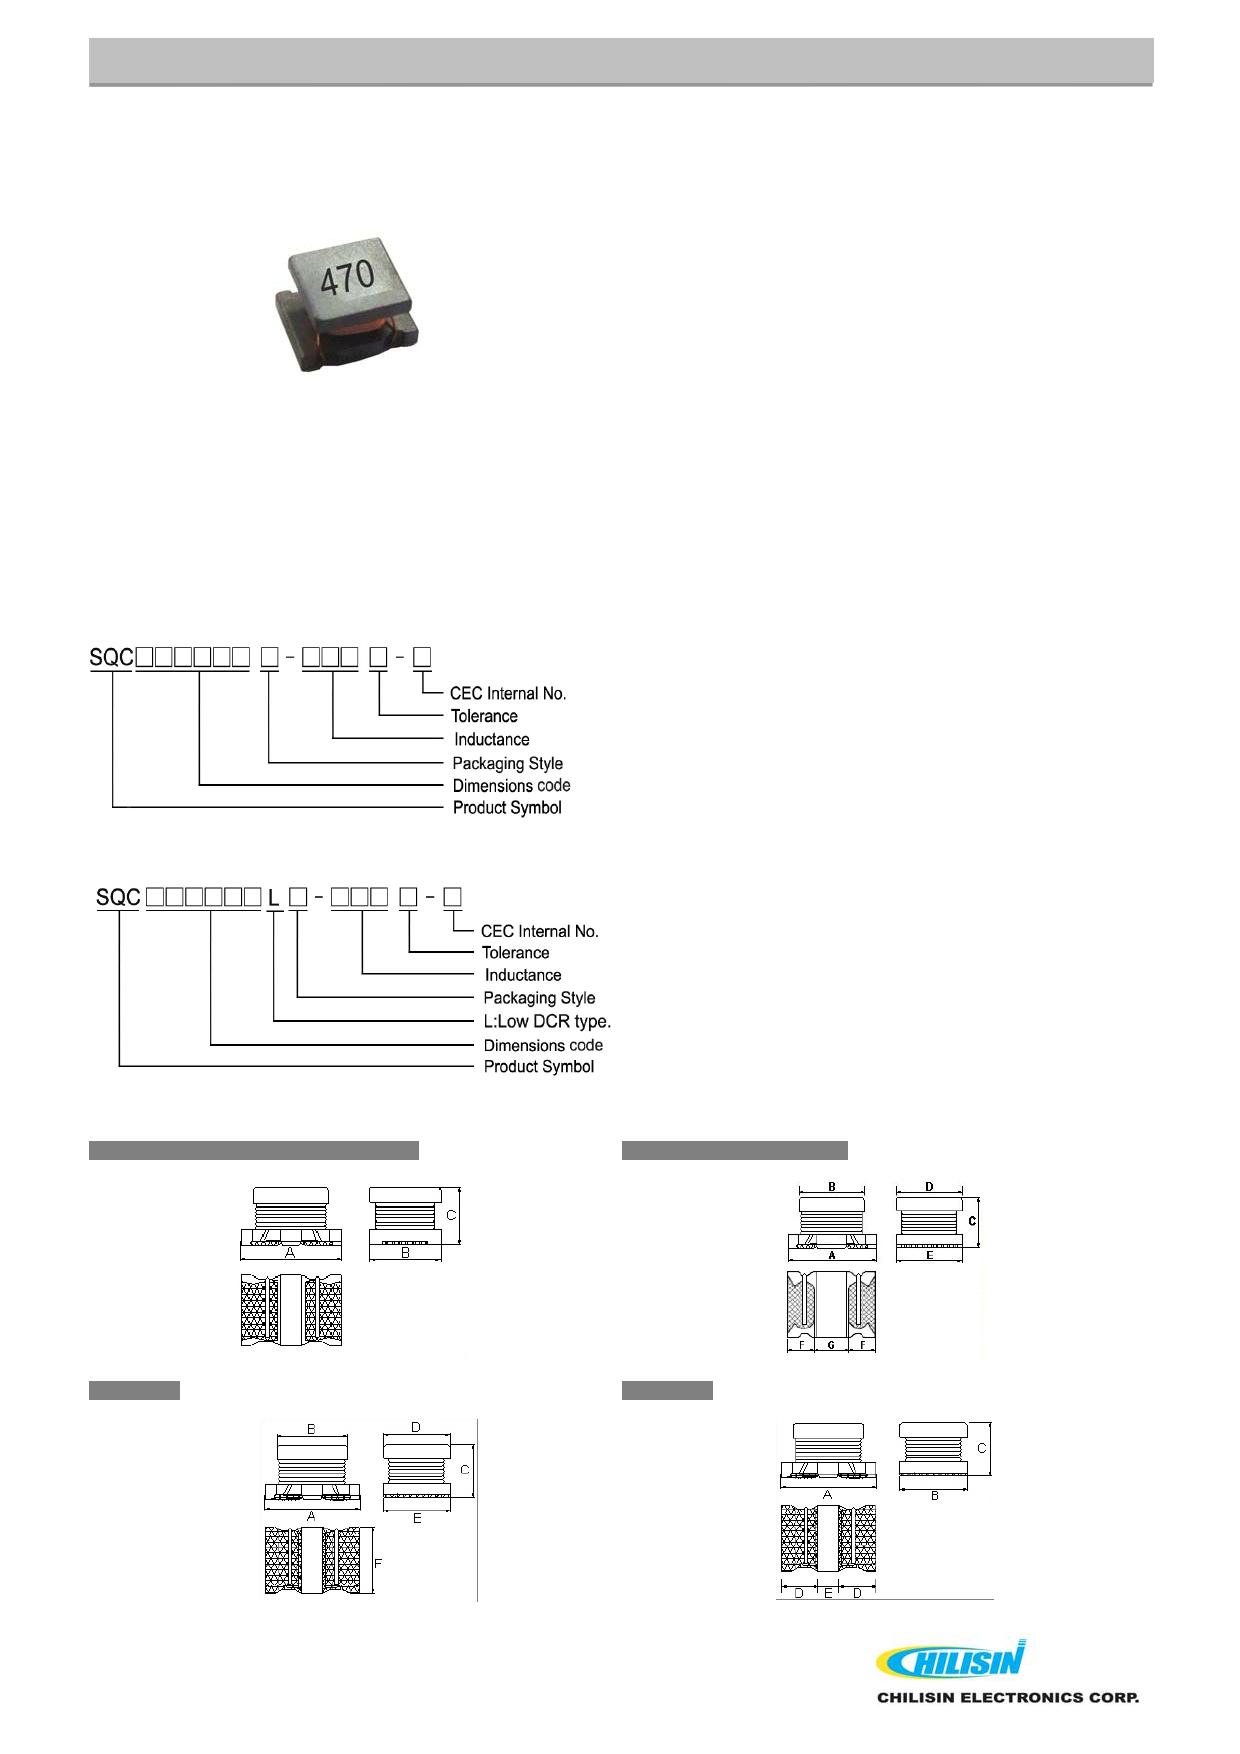 SQC321618 데이터시트 및 SQC321618 PDF